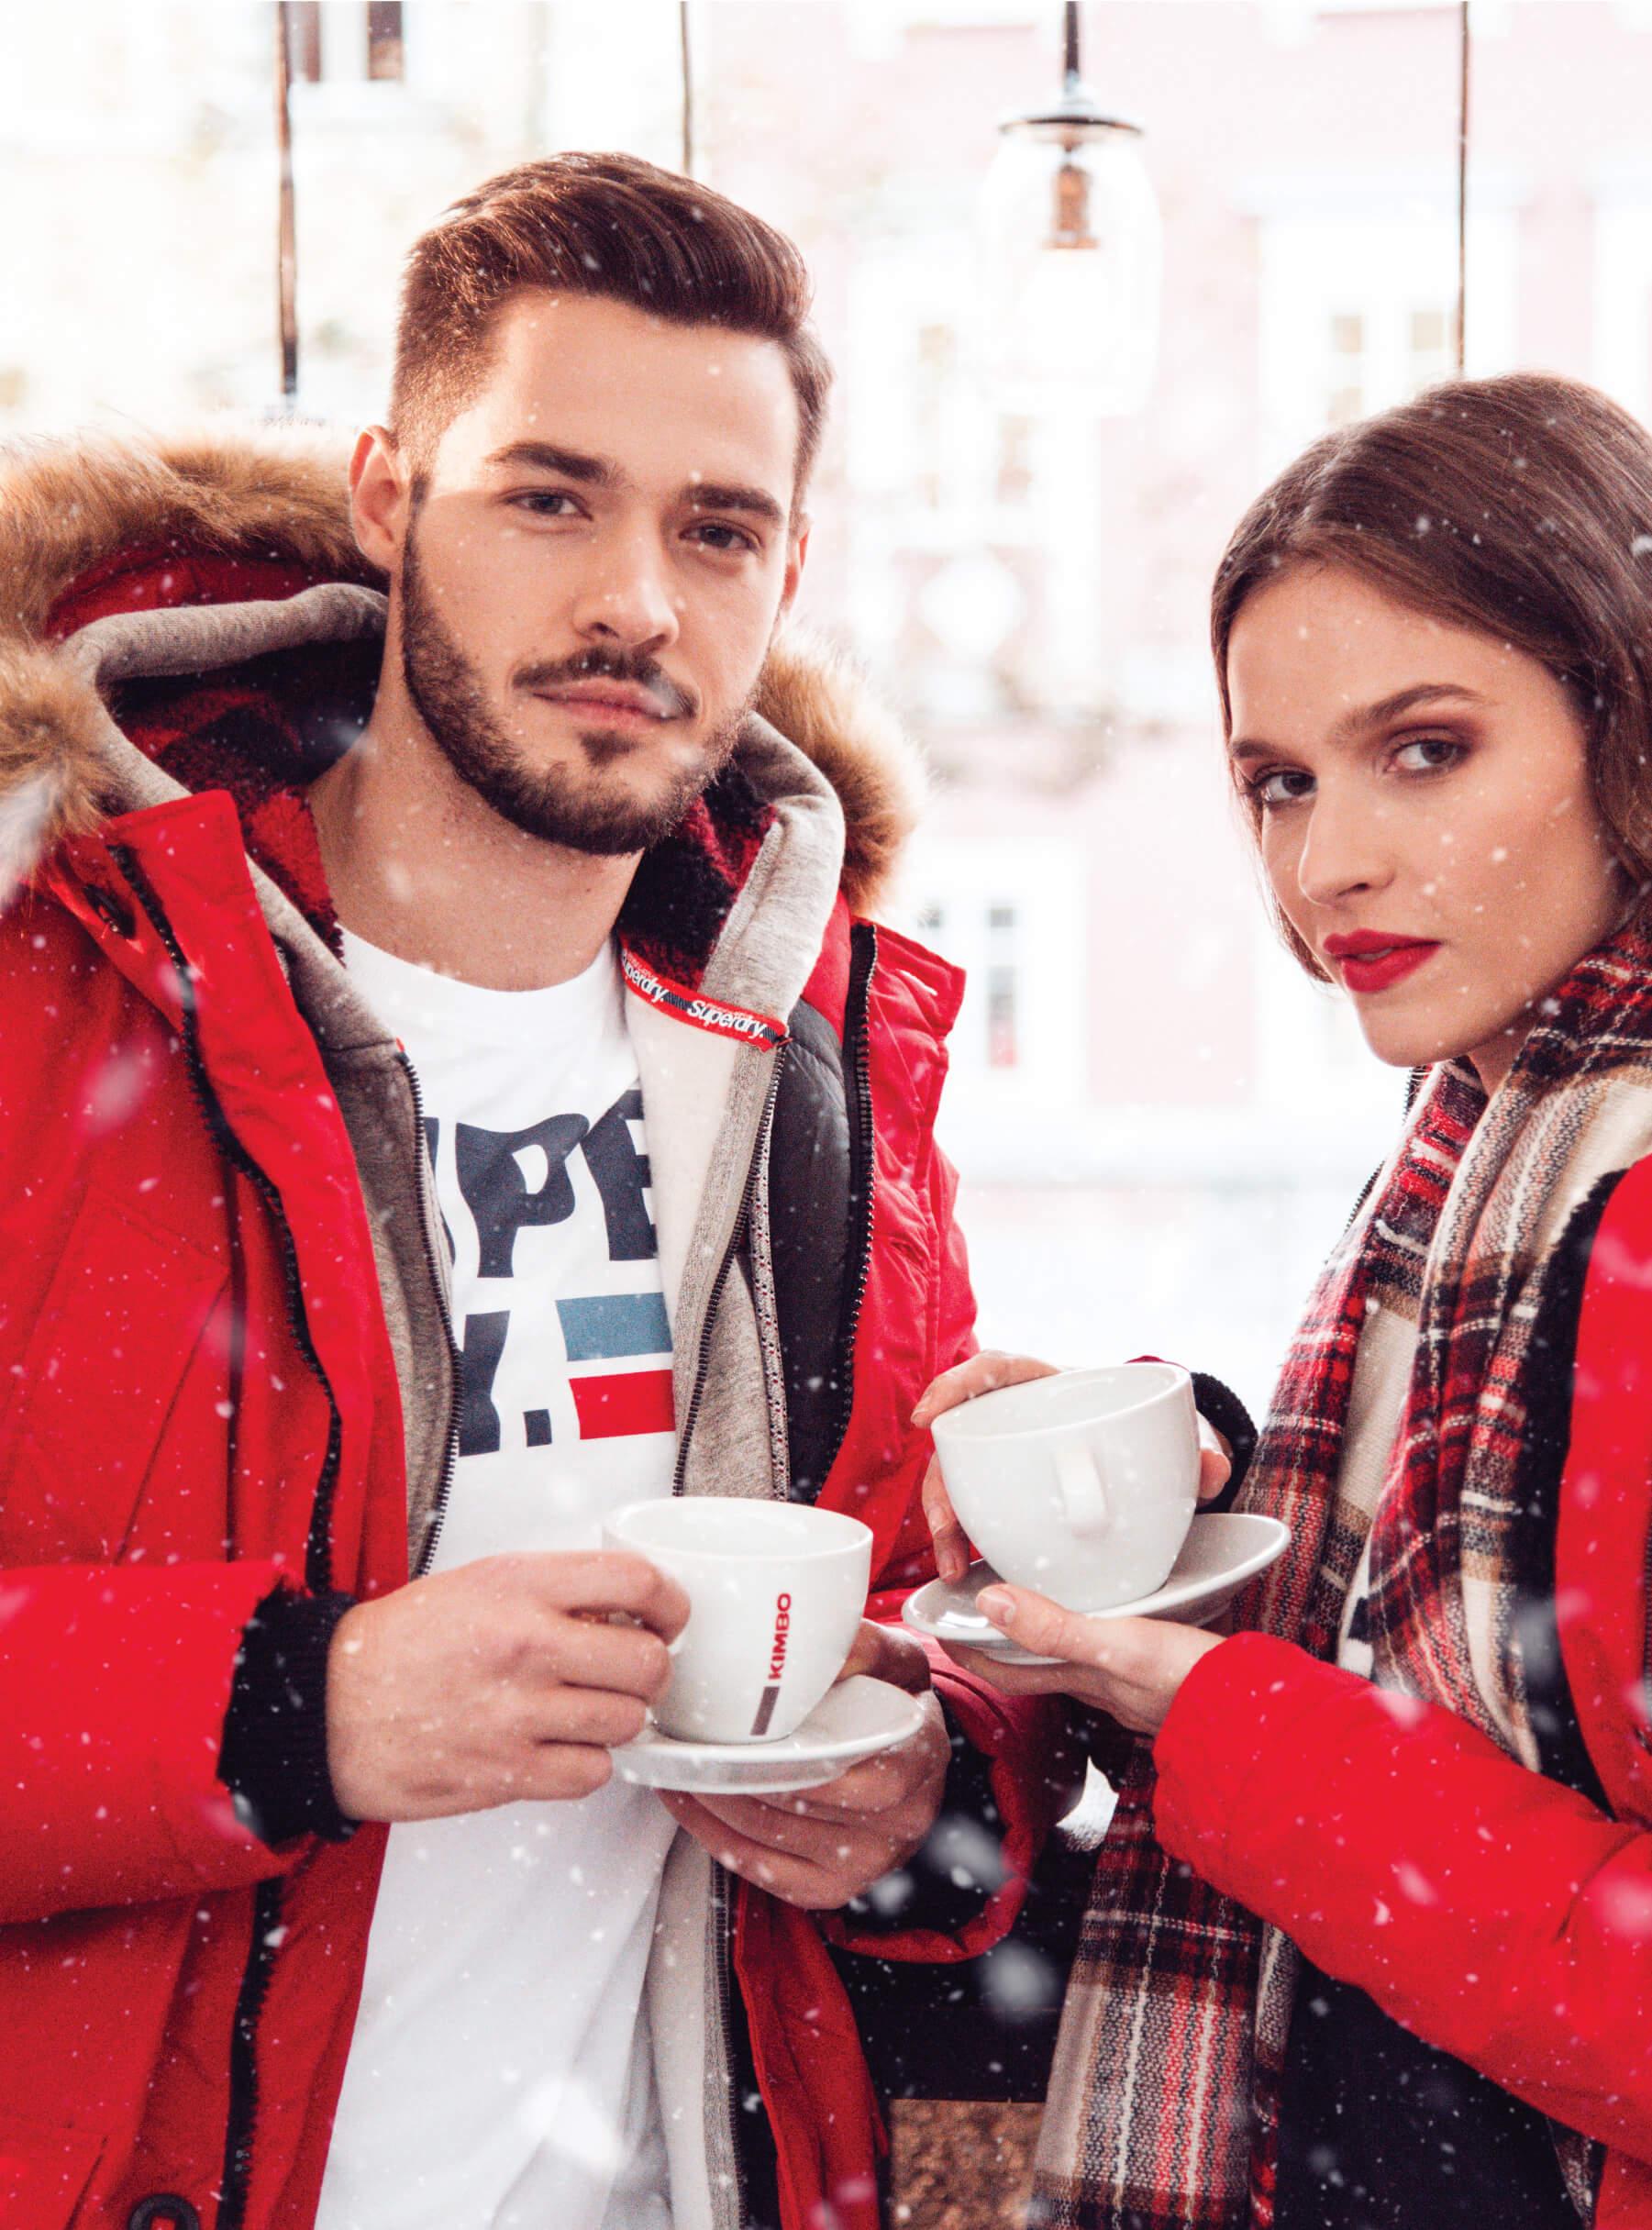 REDOVNE CIJENE: Superdry jakna 179,99 €  Vero Moda šal 17,99 €  Superdry džemper 75,99 €  Only jeans 42,99 €